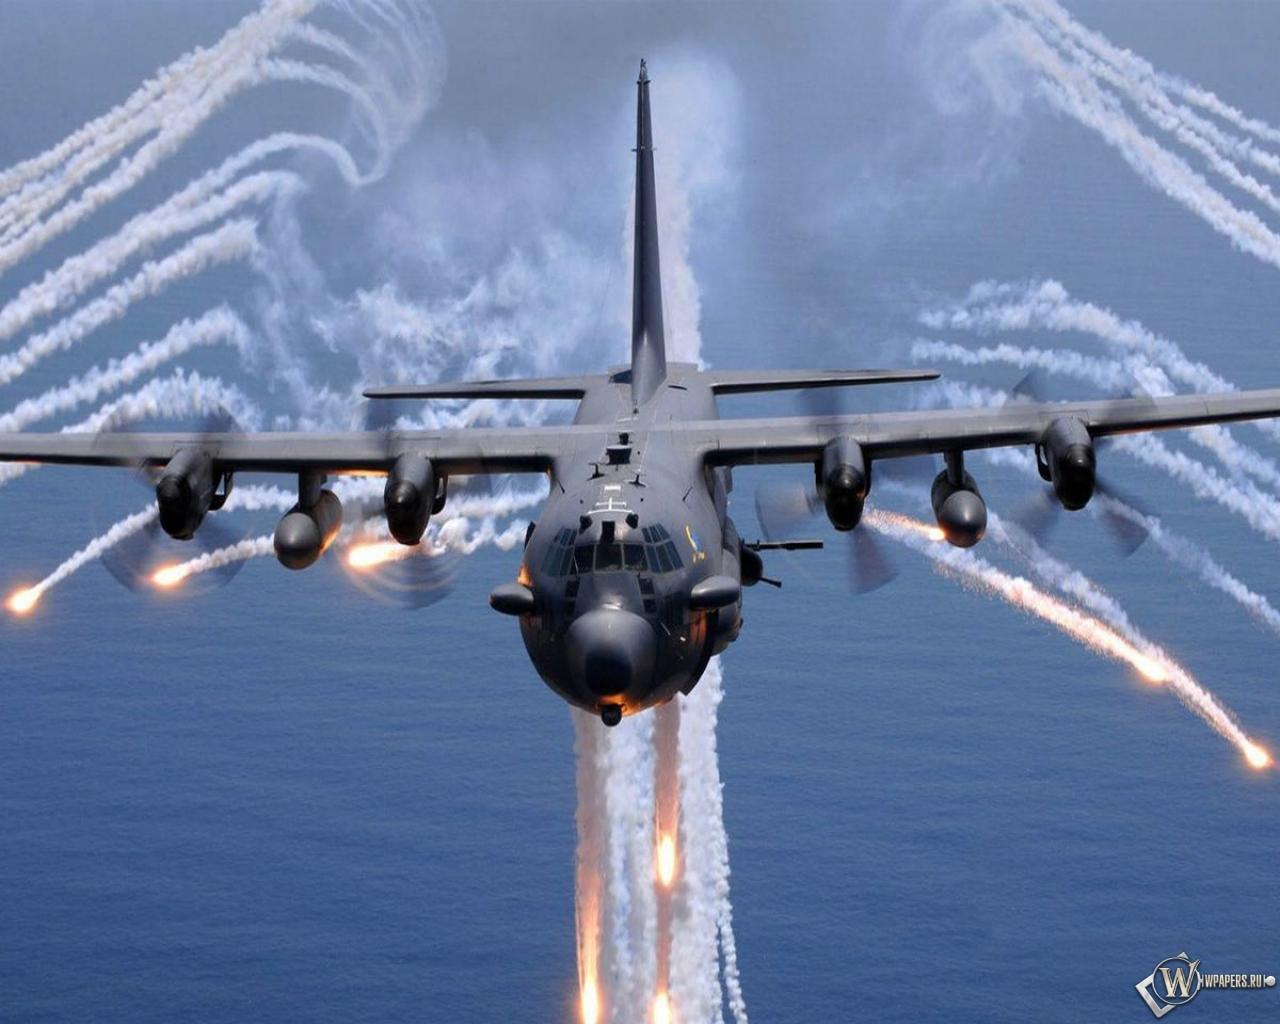 Lockheed AC-130 1280x1024